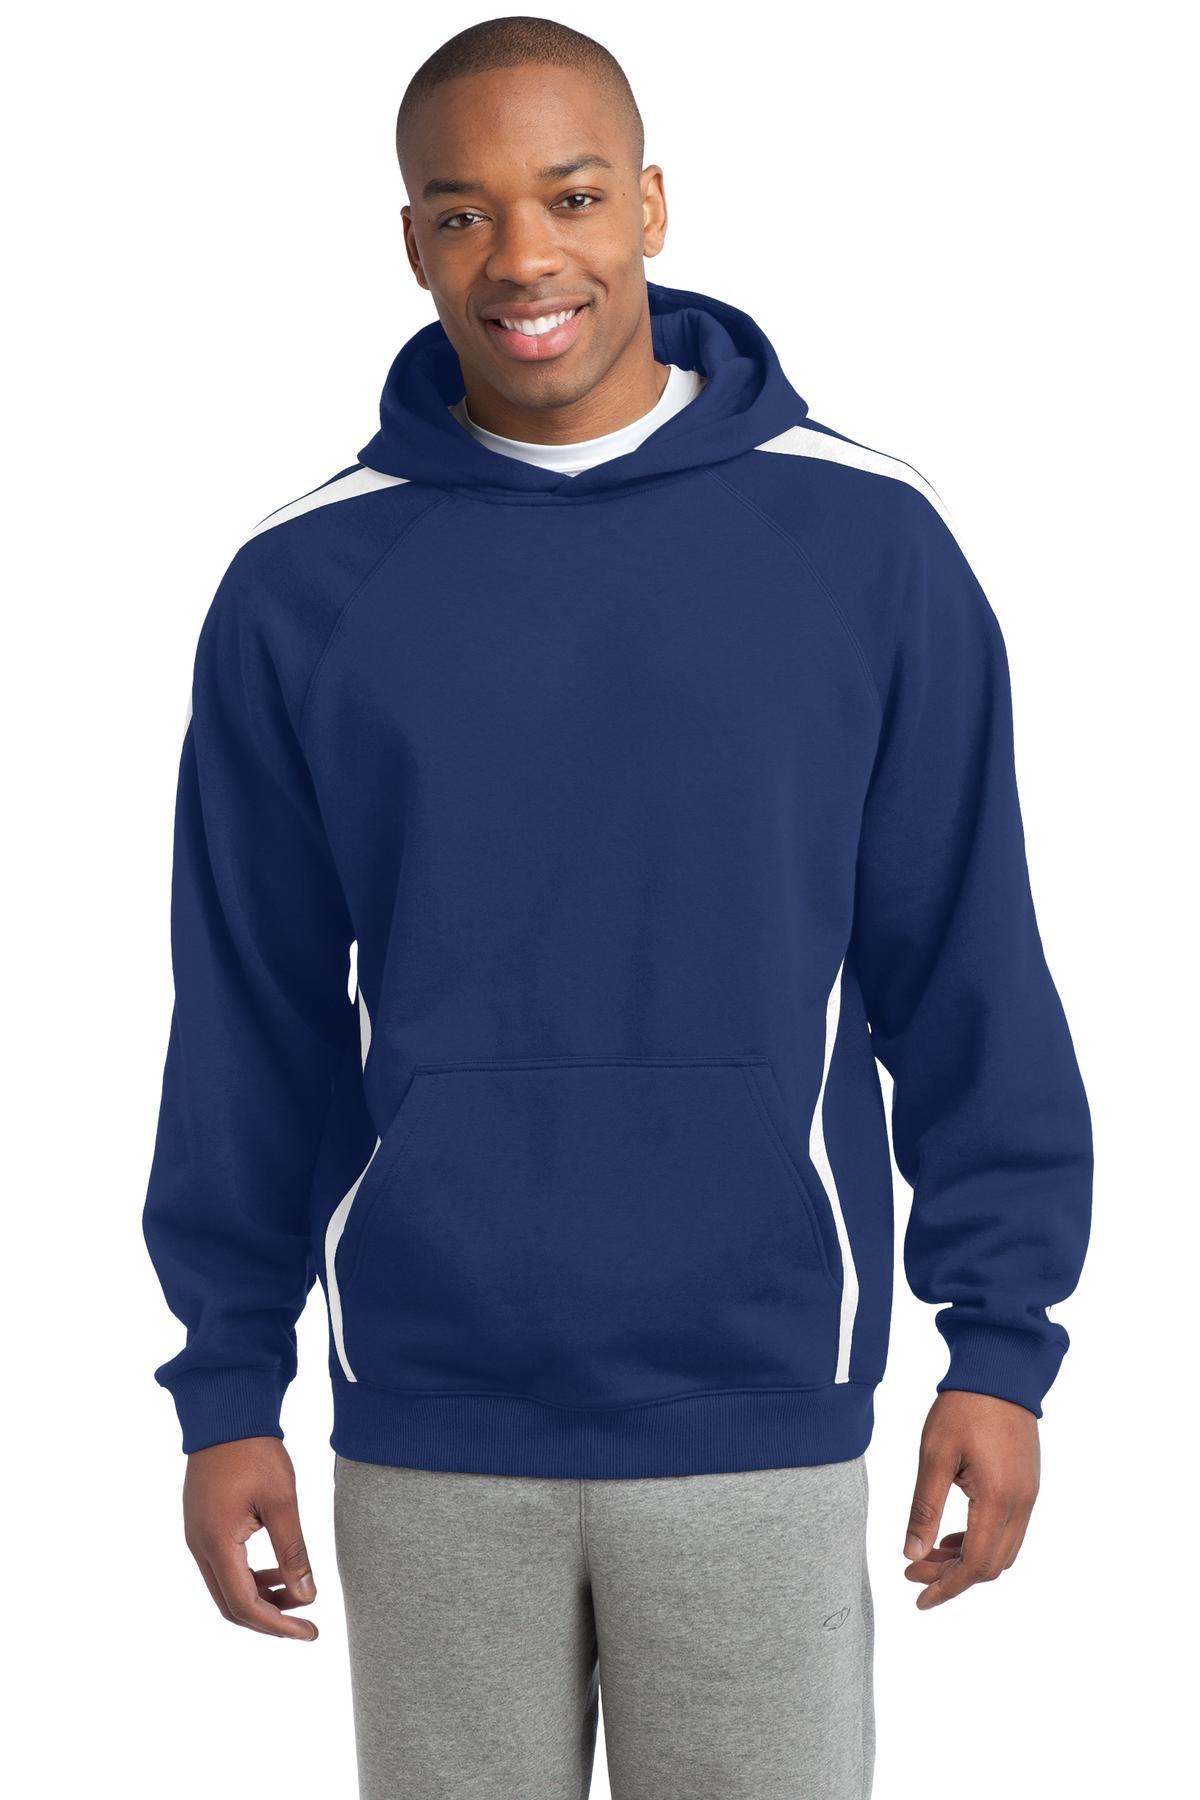 Sport-Tek Men's Sleeve Stripe Pullover Hooded Sweatshirt S True Royal/White by Sport-Tek